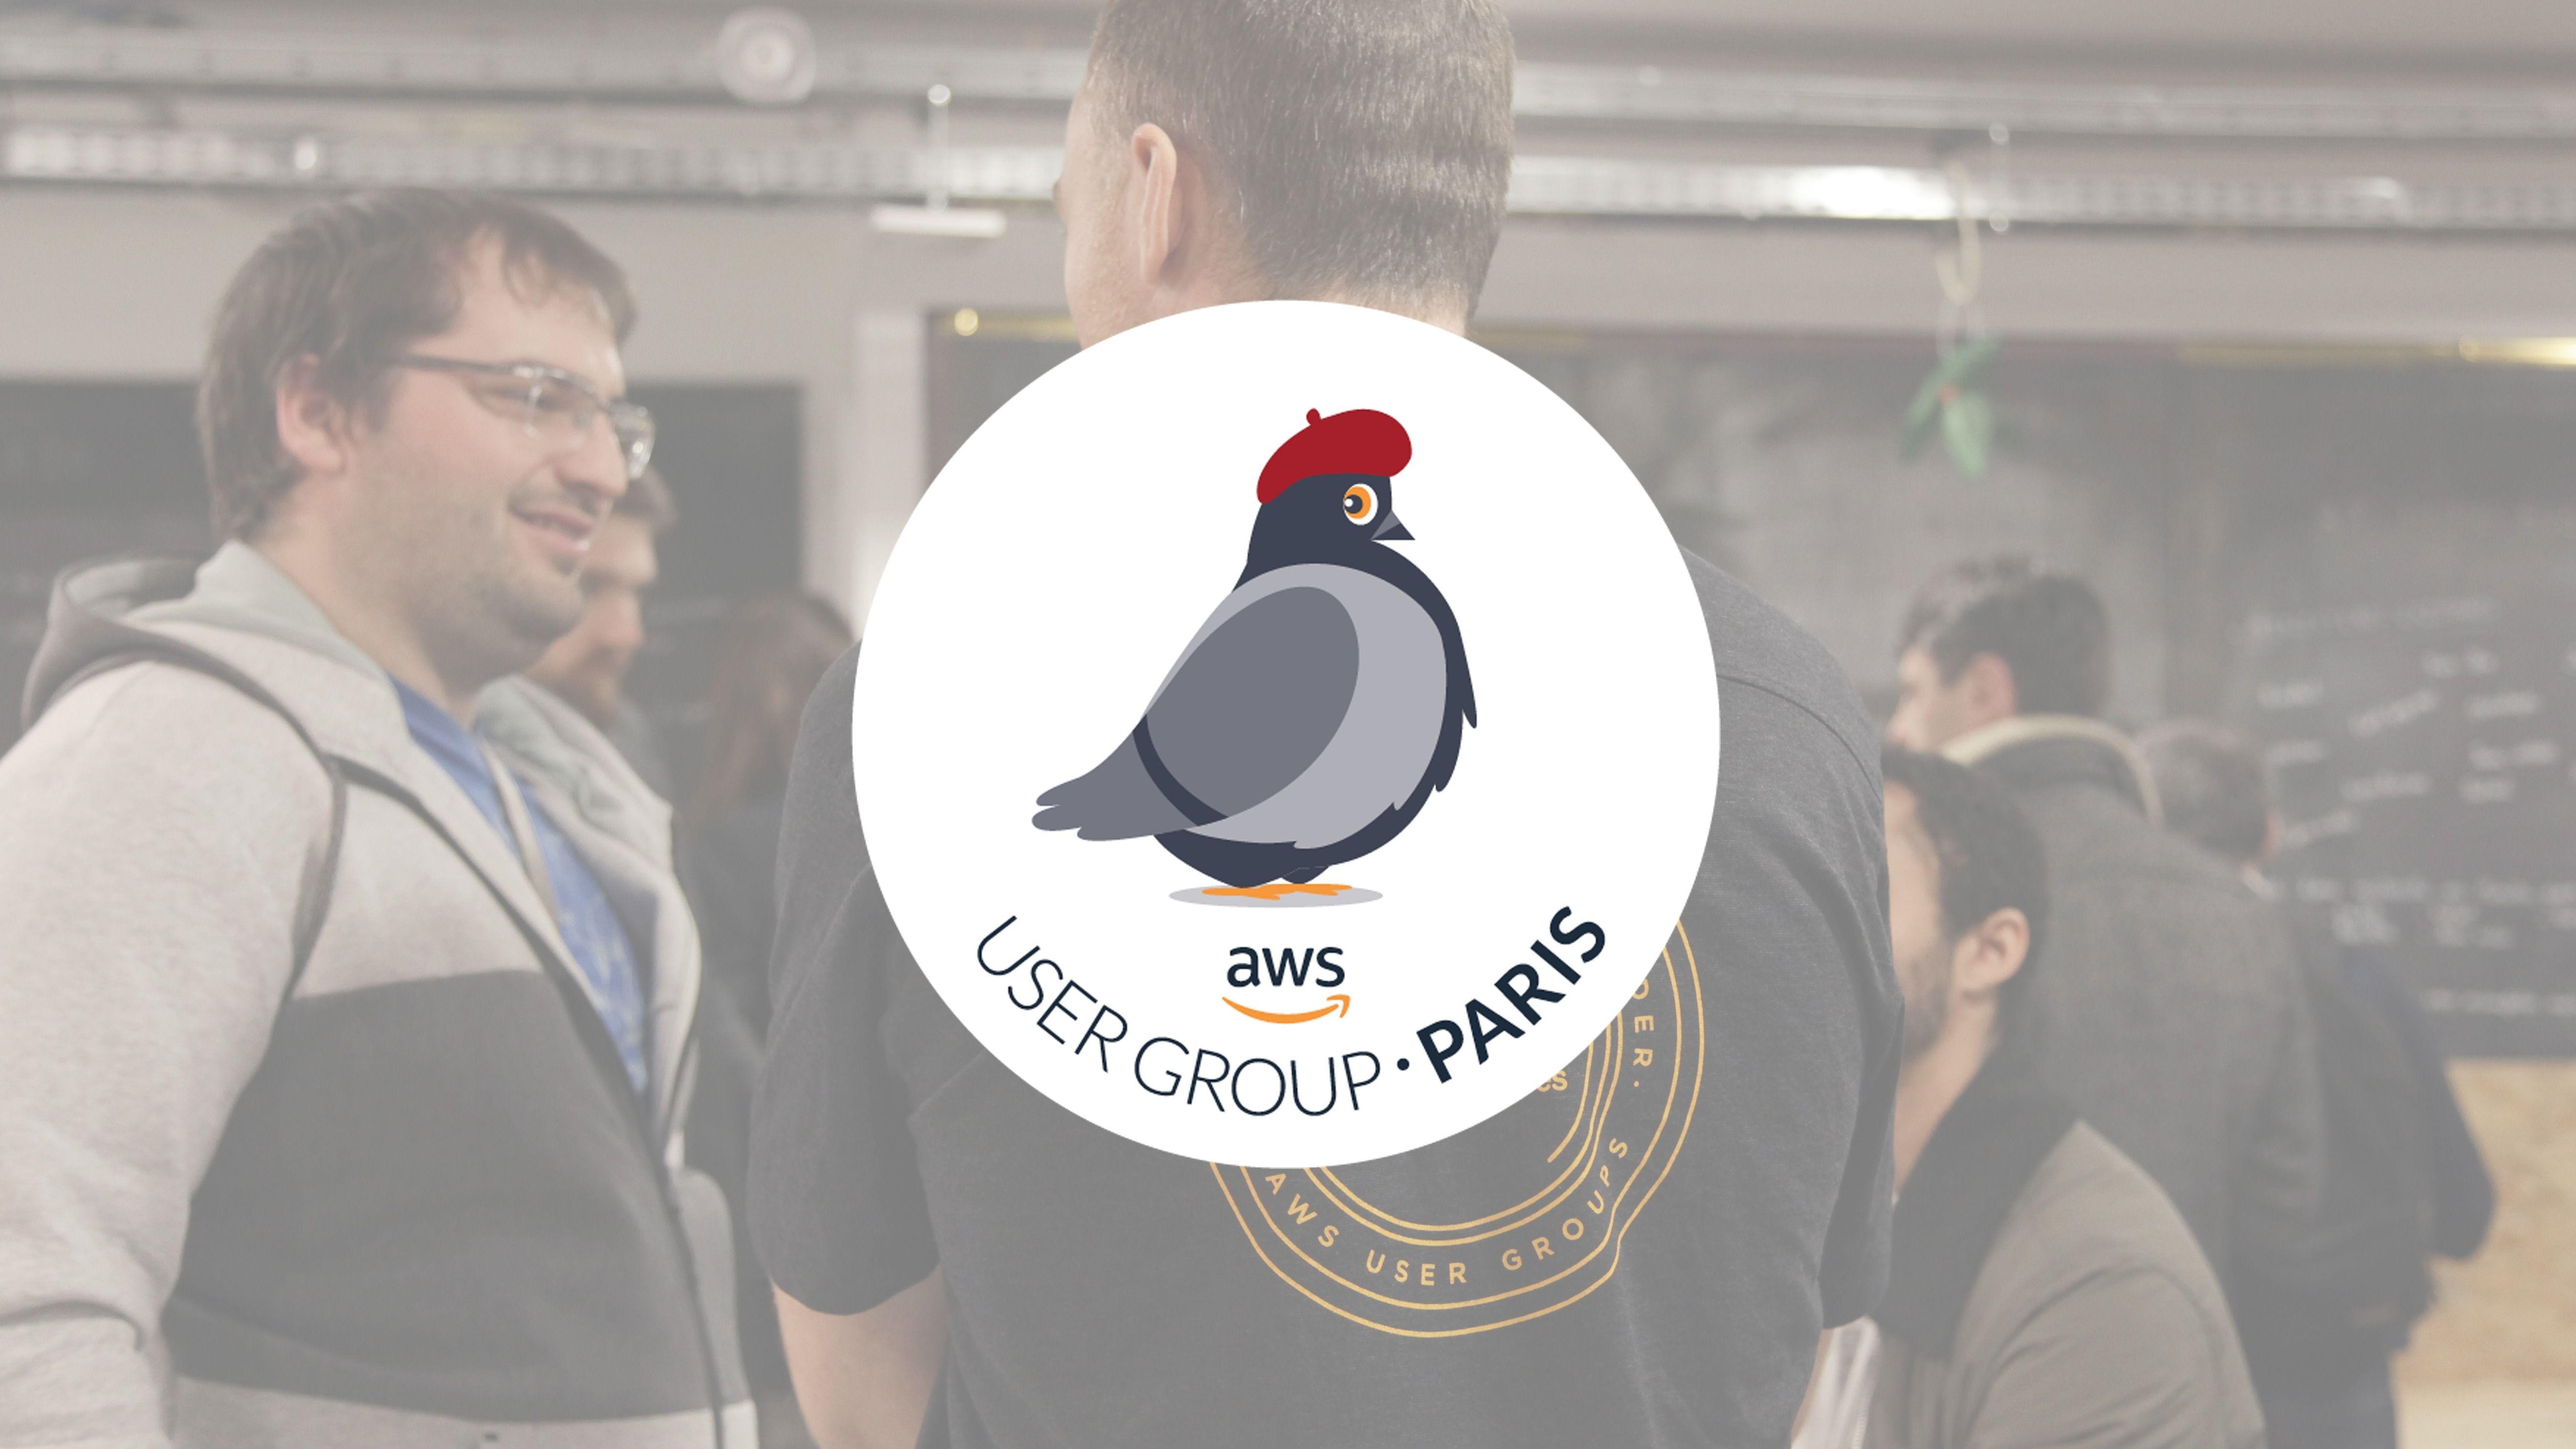 Paris AWS User Group